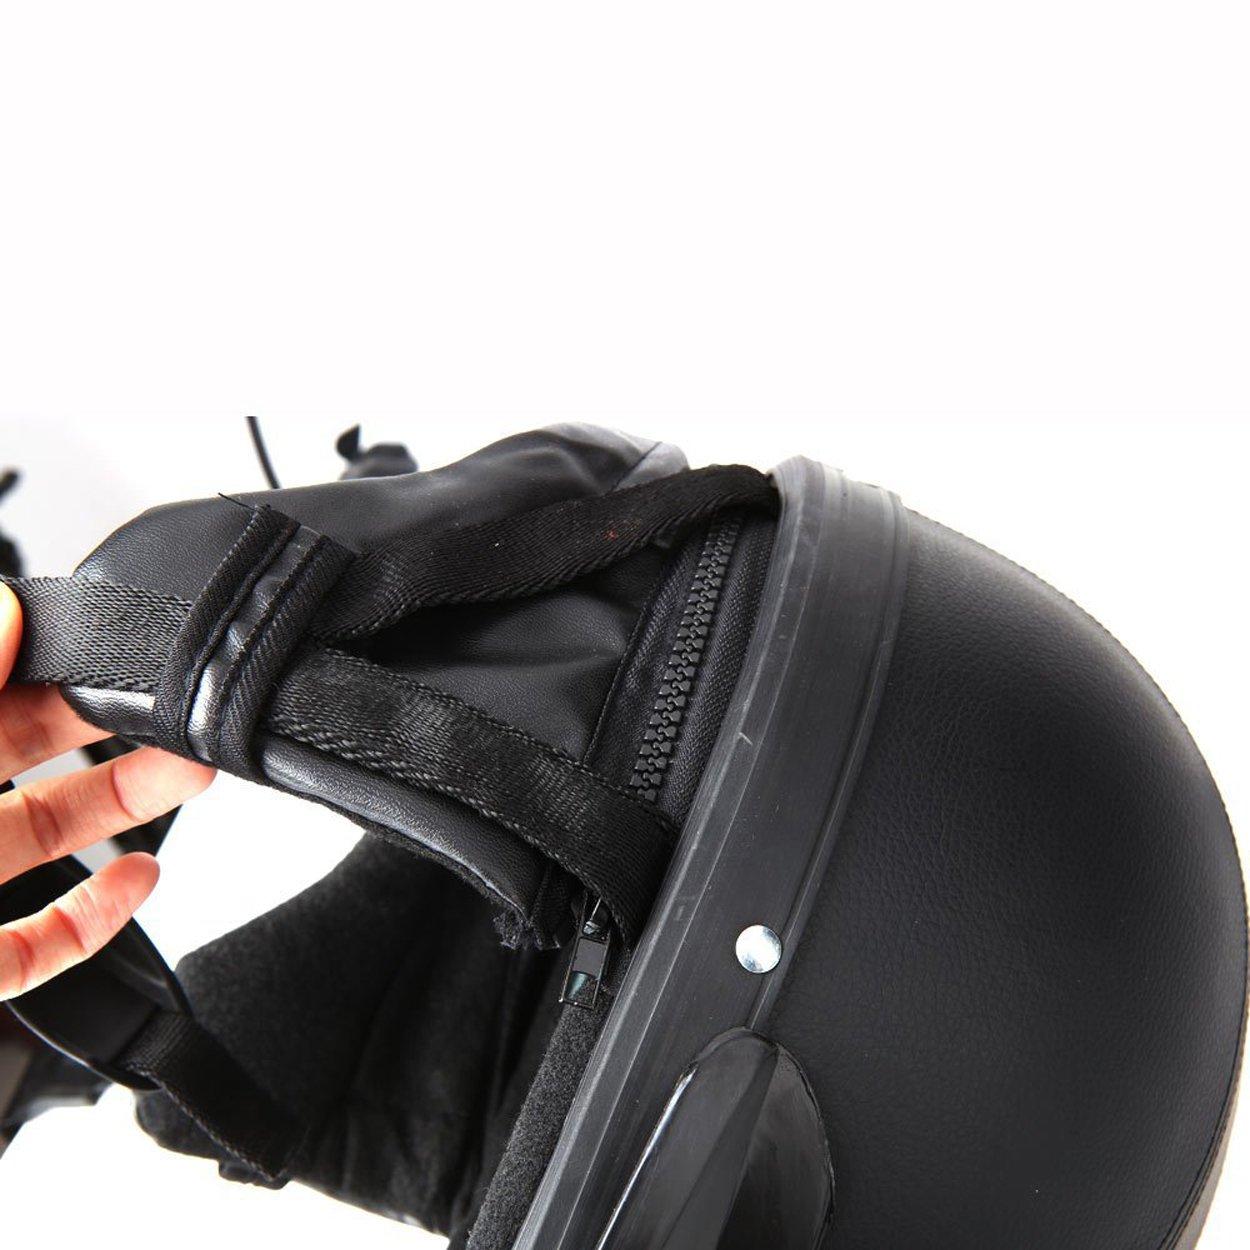 FREESOO Casco Abierto Protecci/ón para Motocicleta Scooter Bicicleta 54-60cm Ajustable con Visera UV Gafas Bufanda